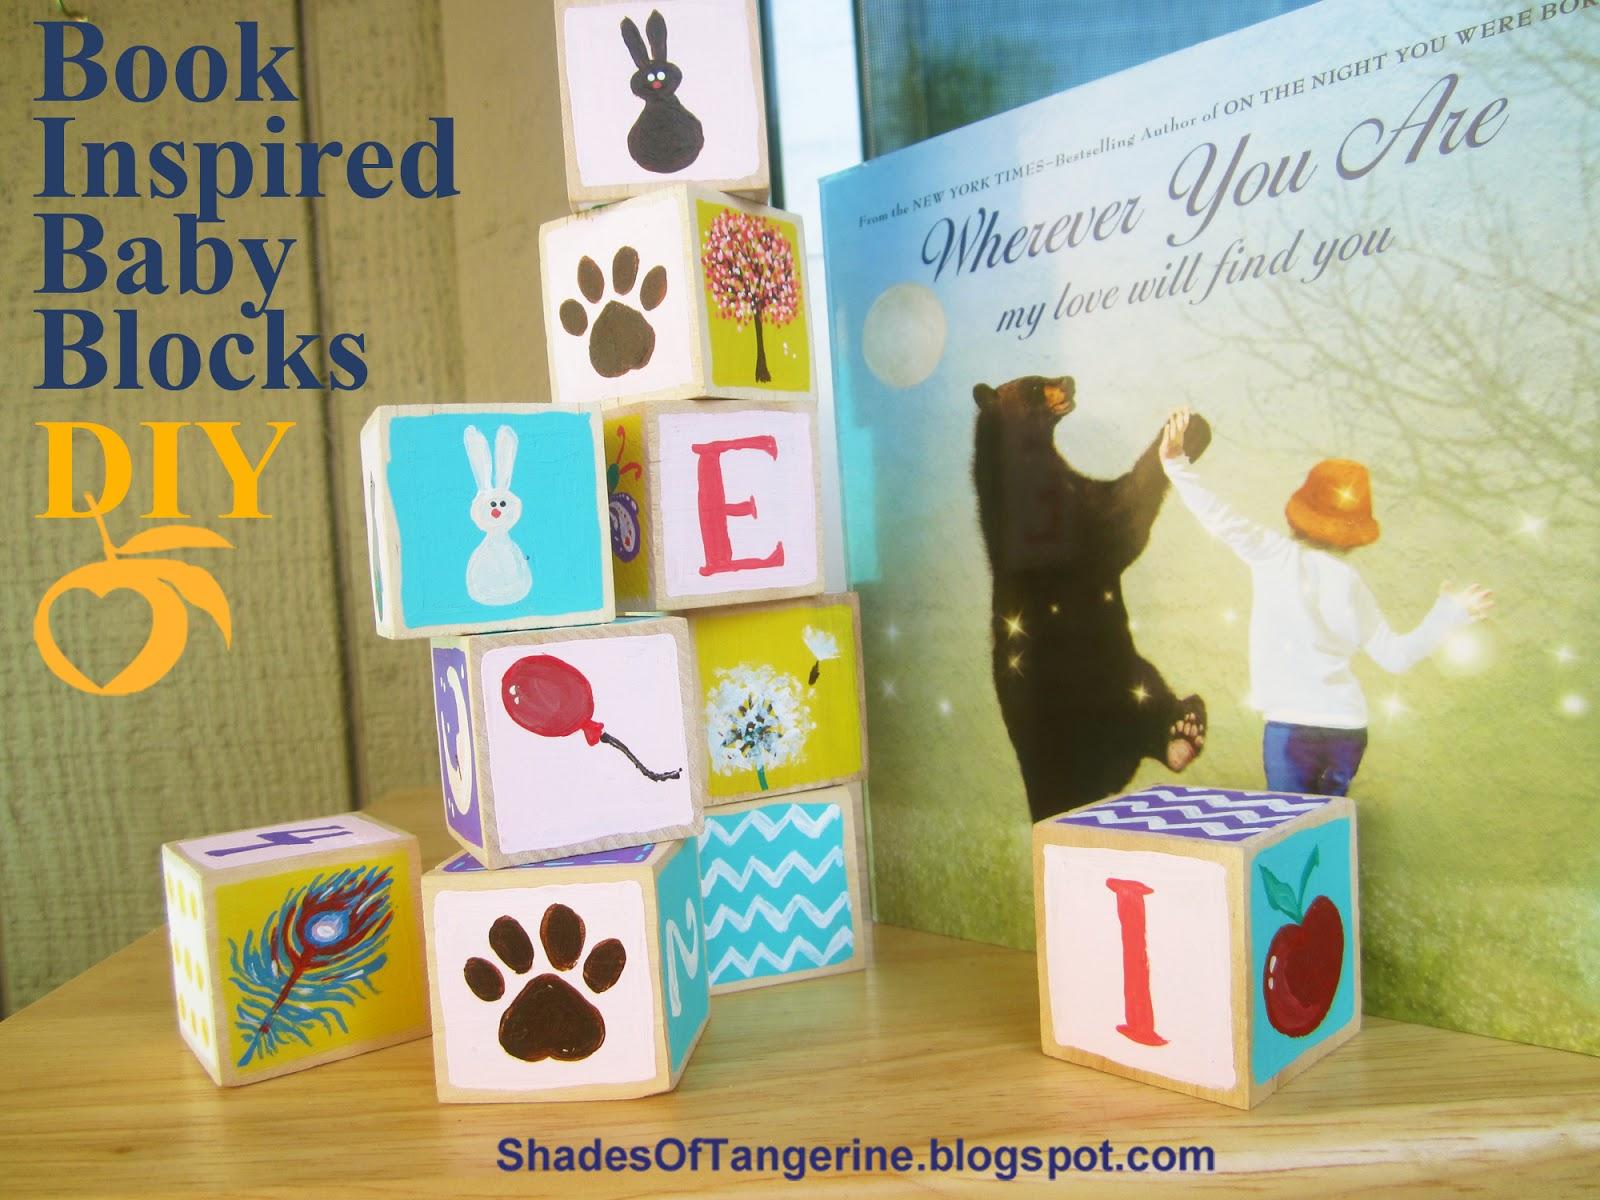 Uncategorized Diy Baby Blocks shades of tangerine book inspired baby blocks diy diy